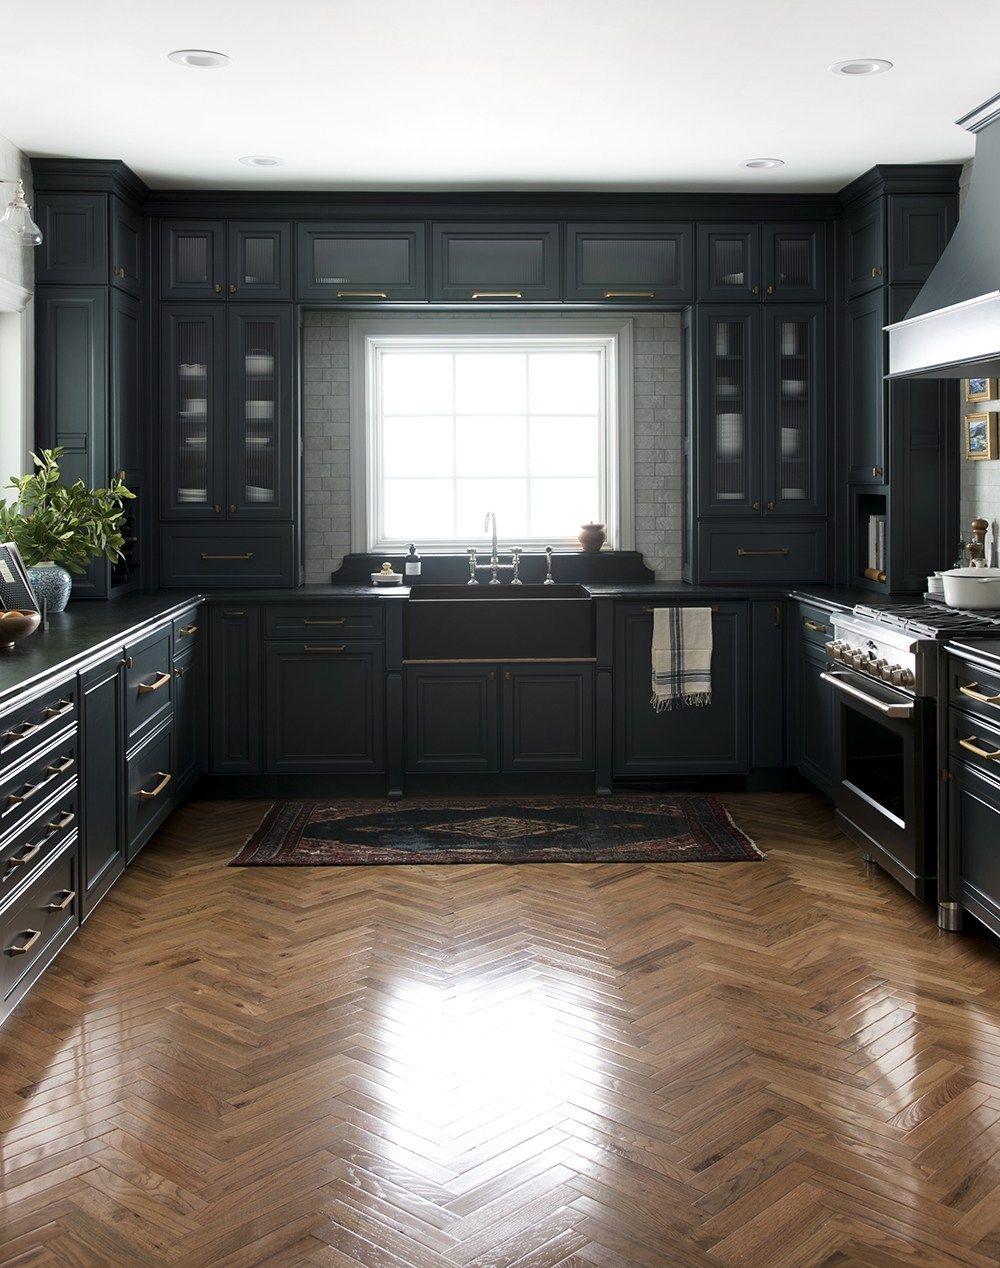 These Modern Kitchen Floor Ideas Deserve Some Serious